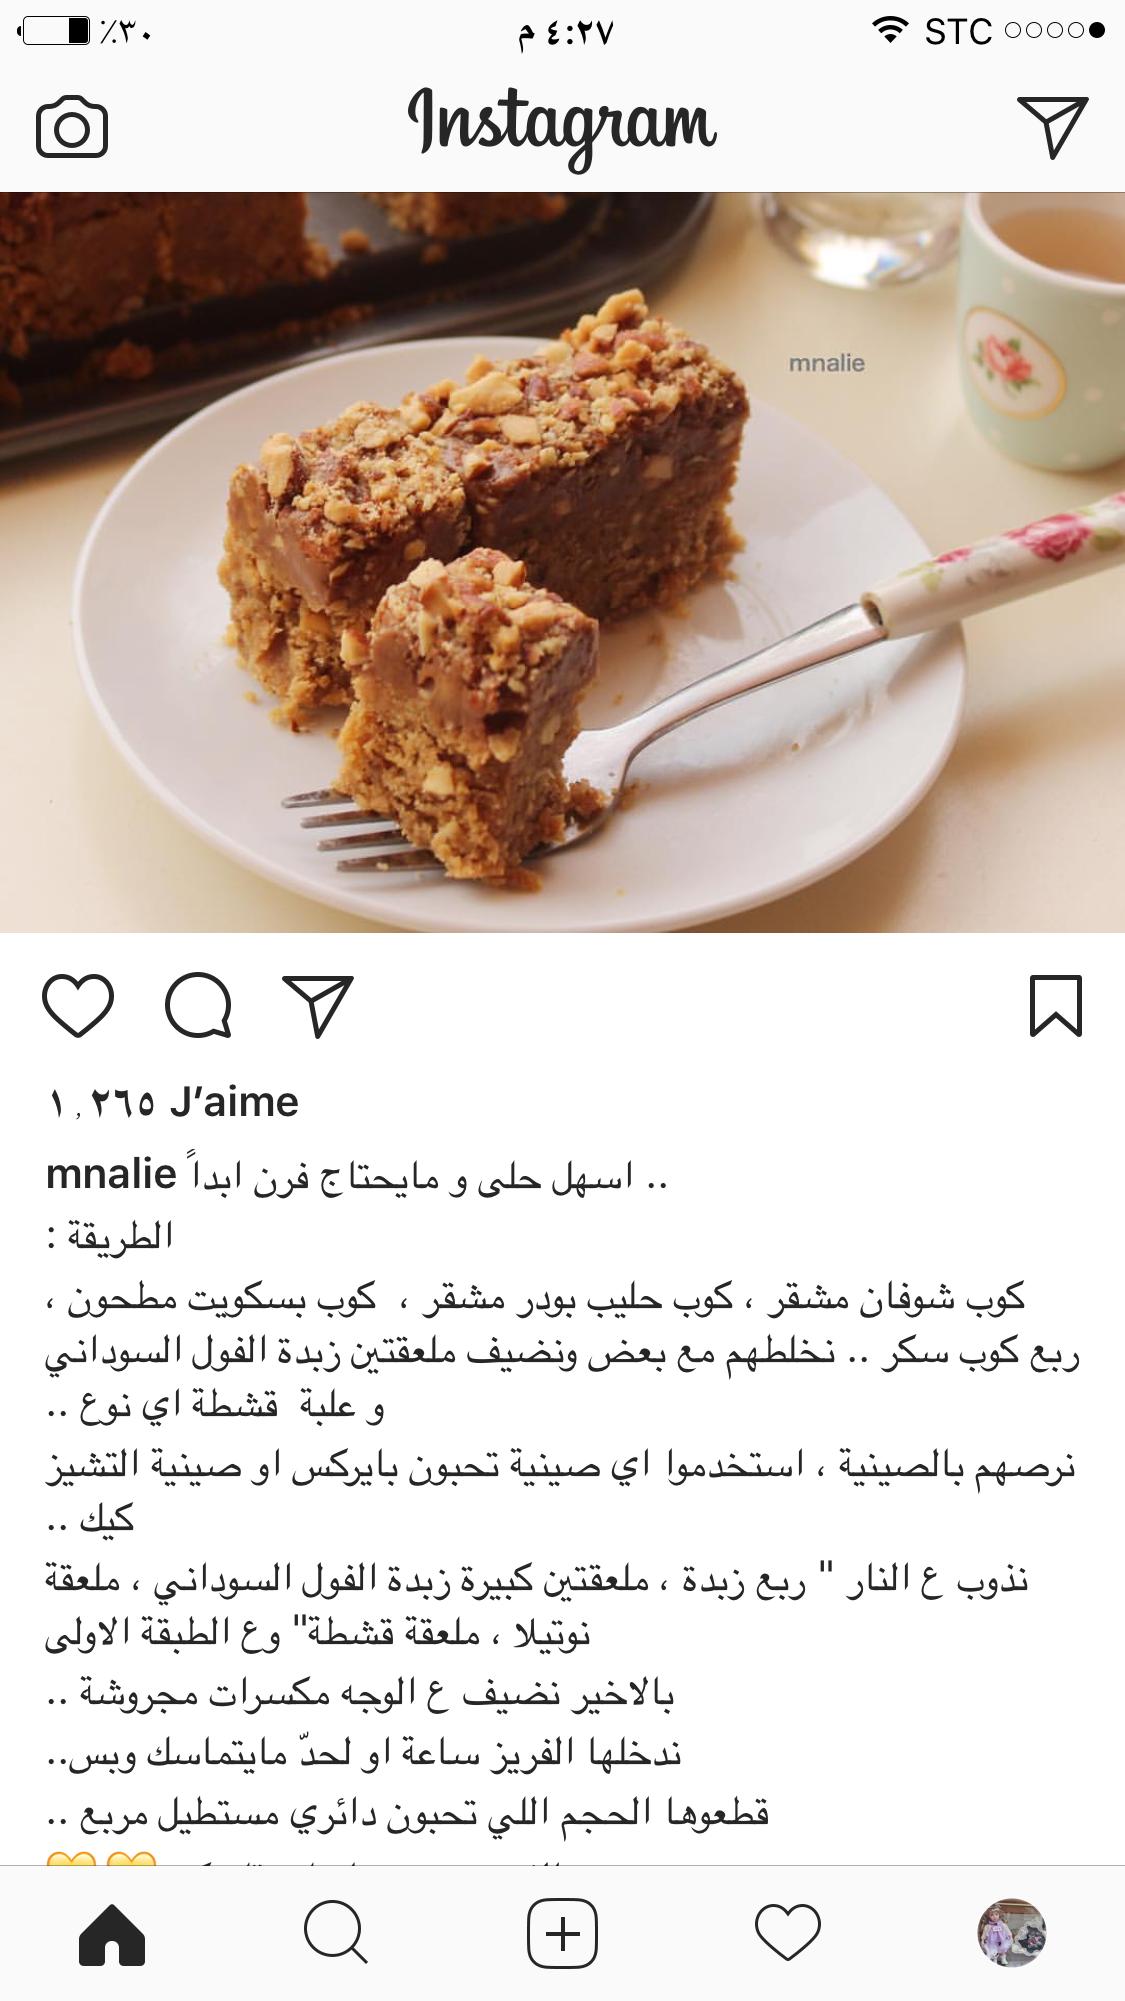 Pin By Khokhah Mash On وصفات بالعربي Yummy Food Dessert Arabic Sweets Recipes Sweets Recipes